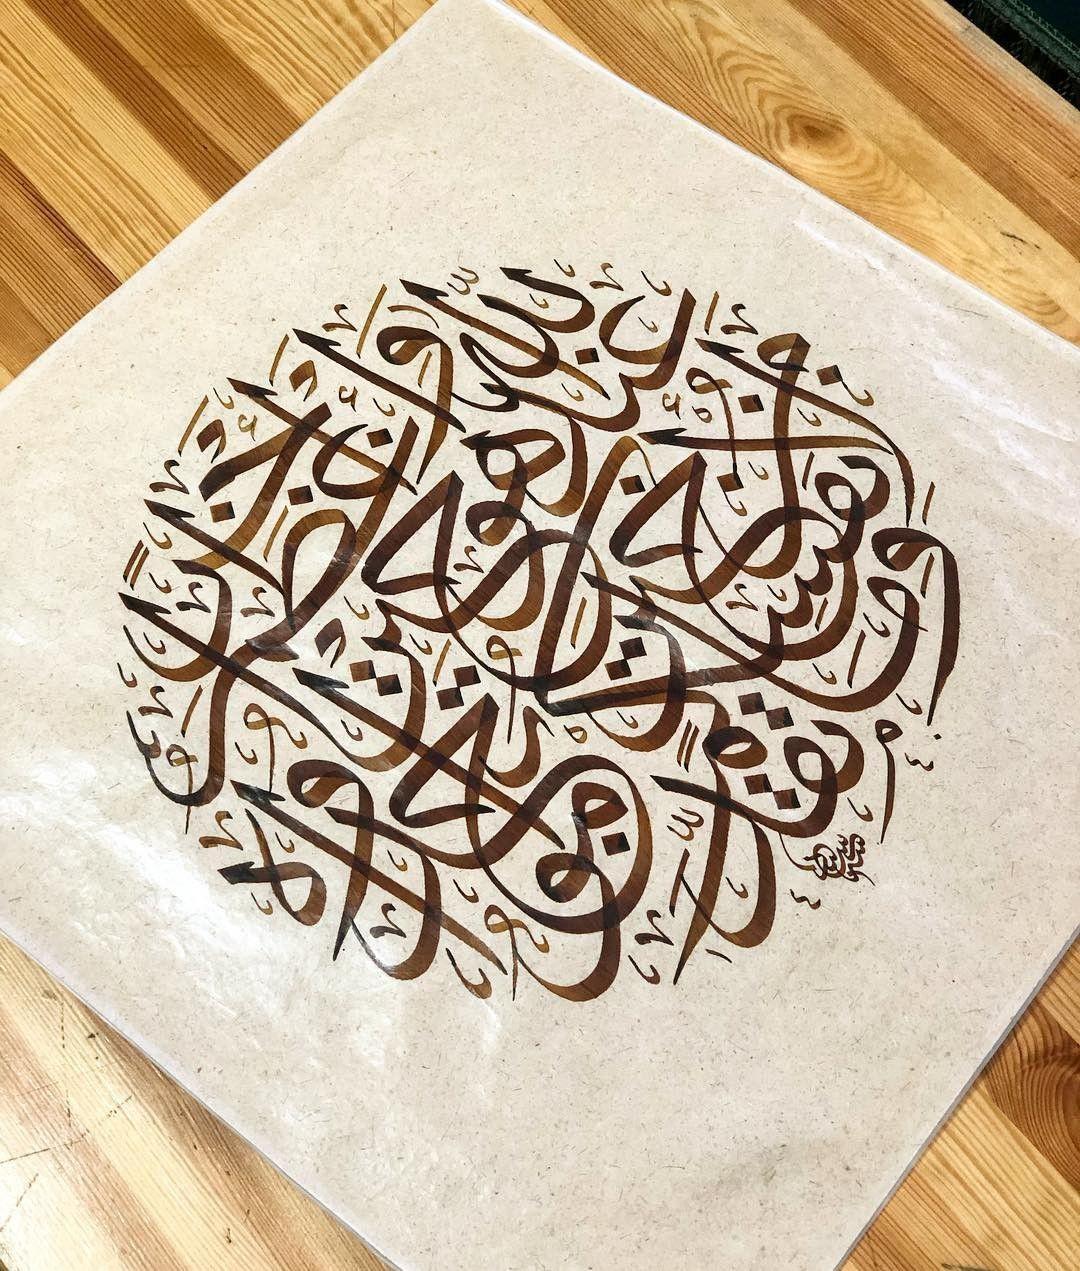 Pin By Zulfi On Arabic Calligraphy Arabic Calligraphy